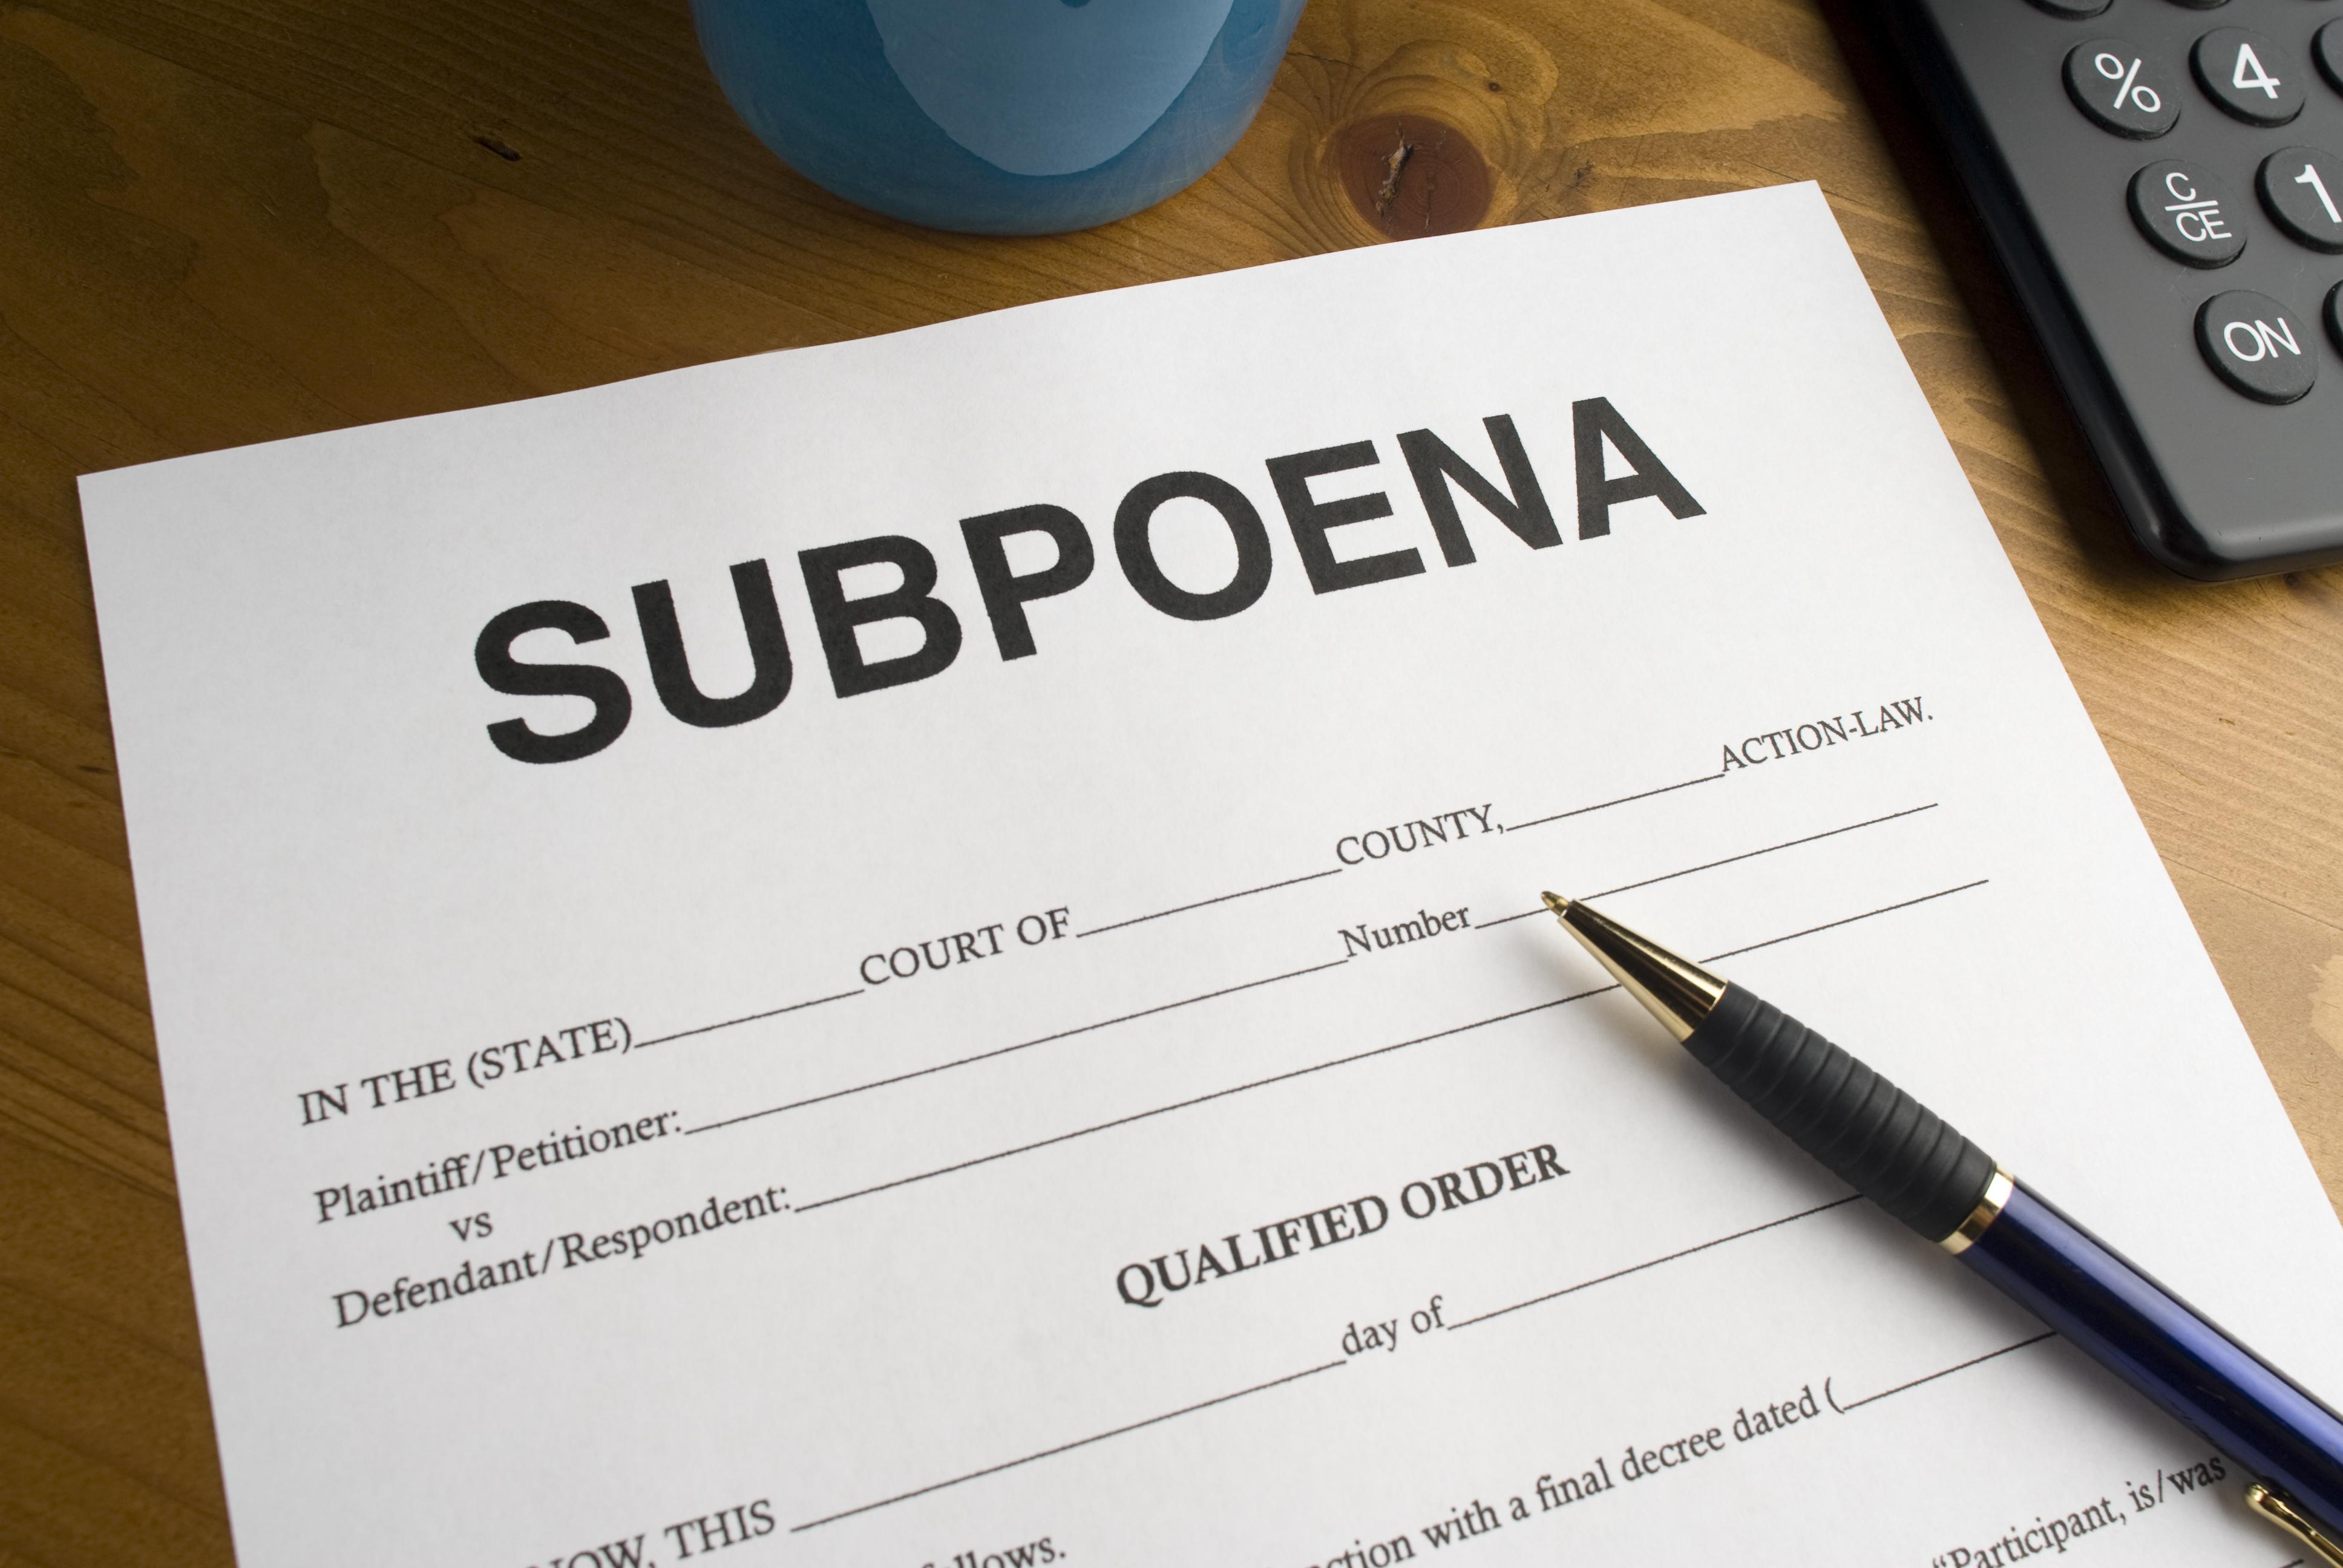 Process Service Subpoena Request